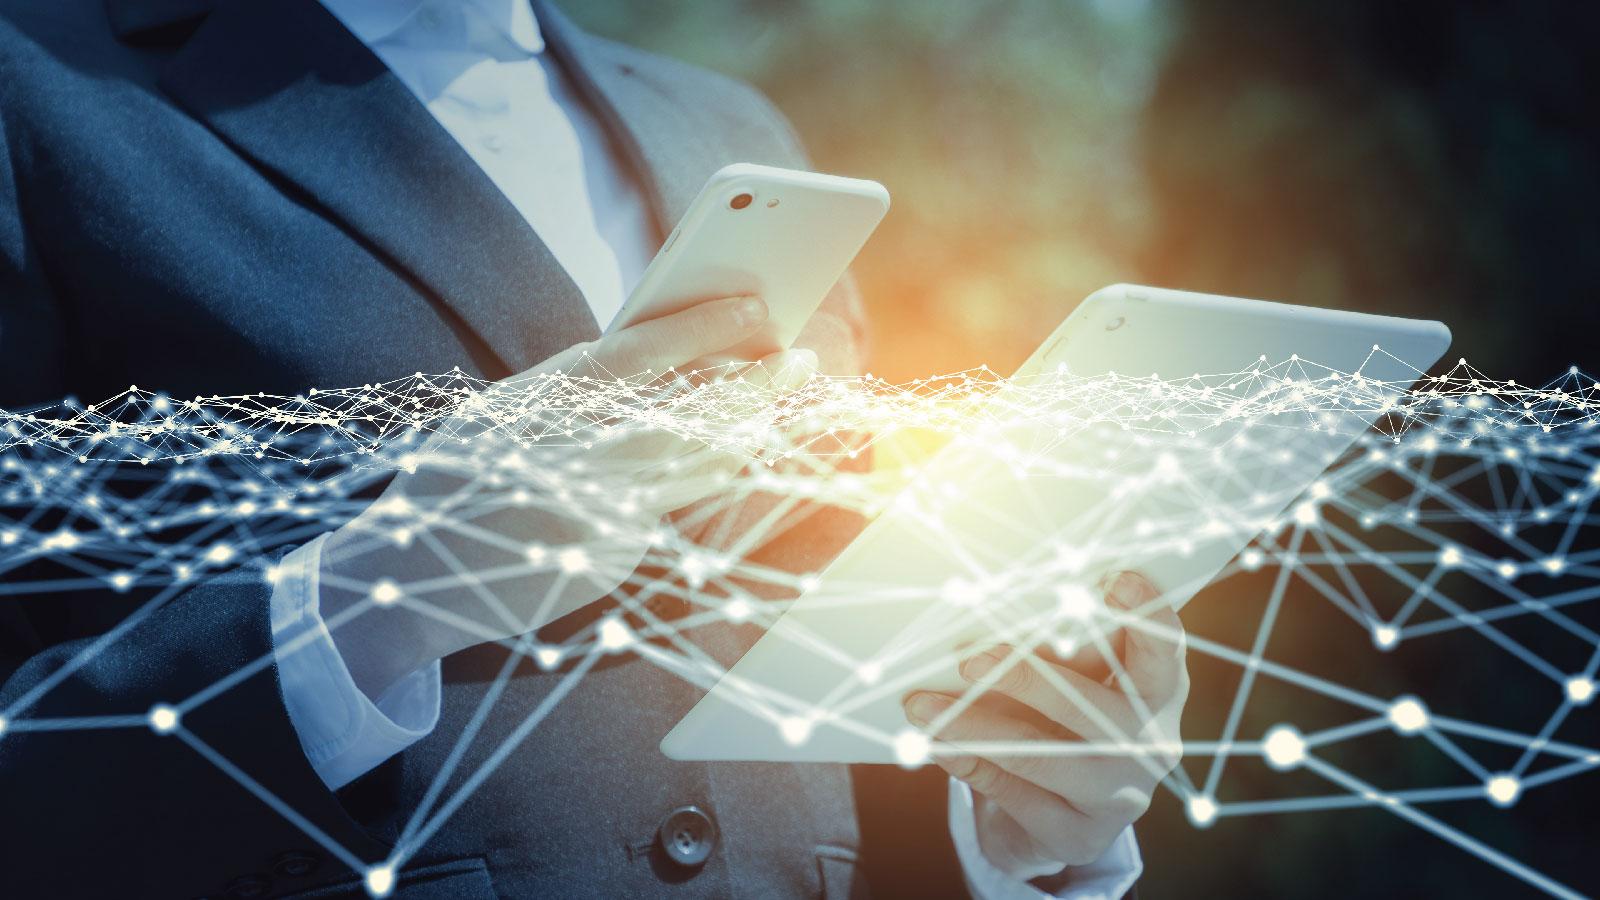 Digital Transformation, Digital age, Digitization, Technology Transformation, Company Values, Workforce Training, Upskilling, Company culture, Market Research, competitor analysis, CEO, CTO, Digital Transformation, Digital age, Digitization, Technology Transformation